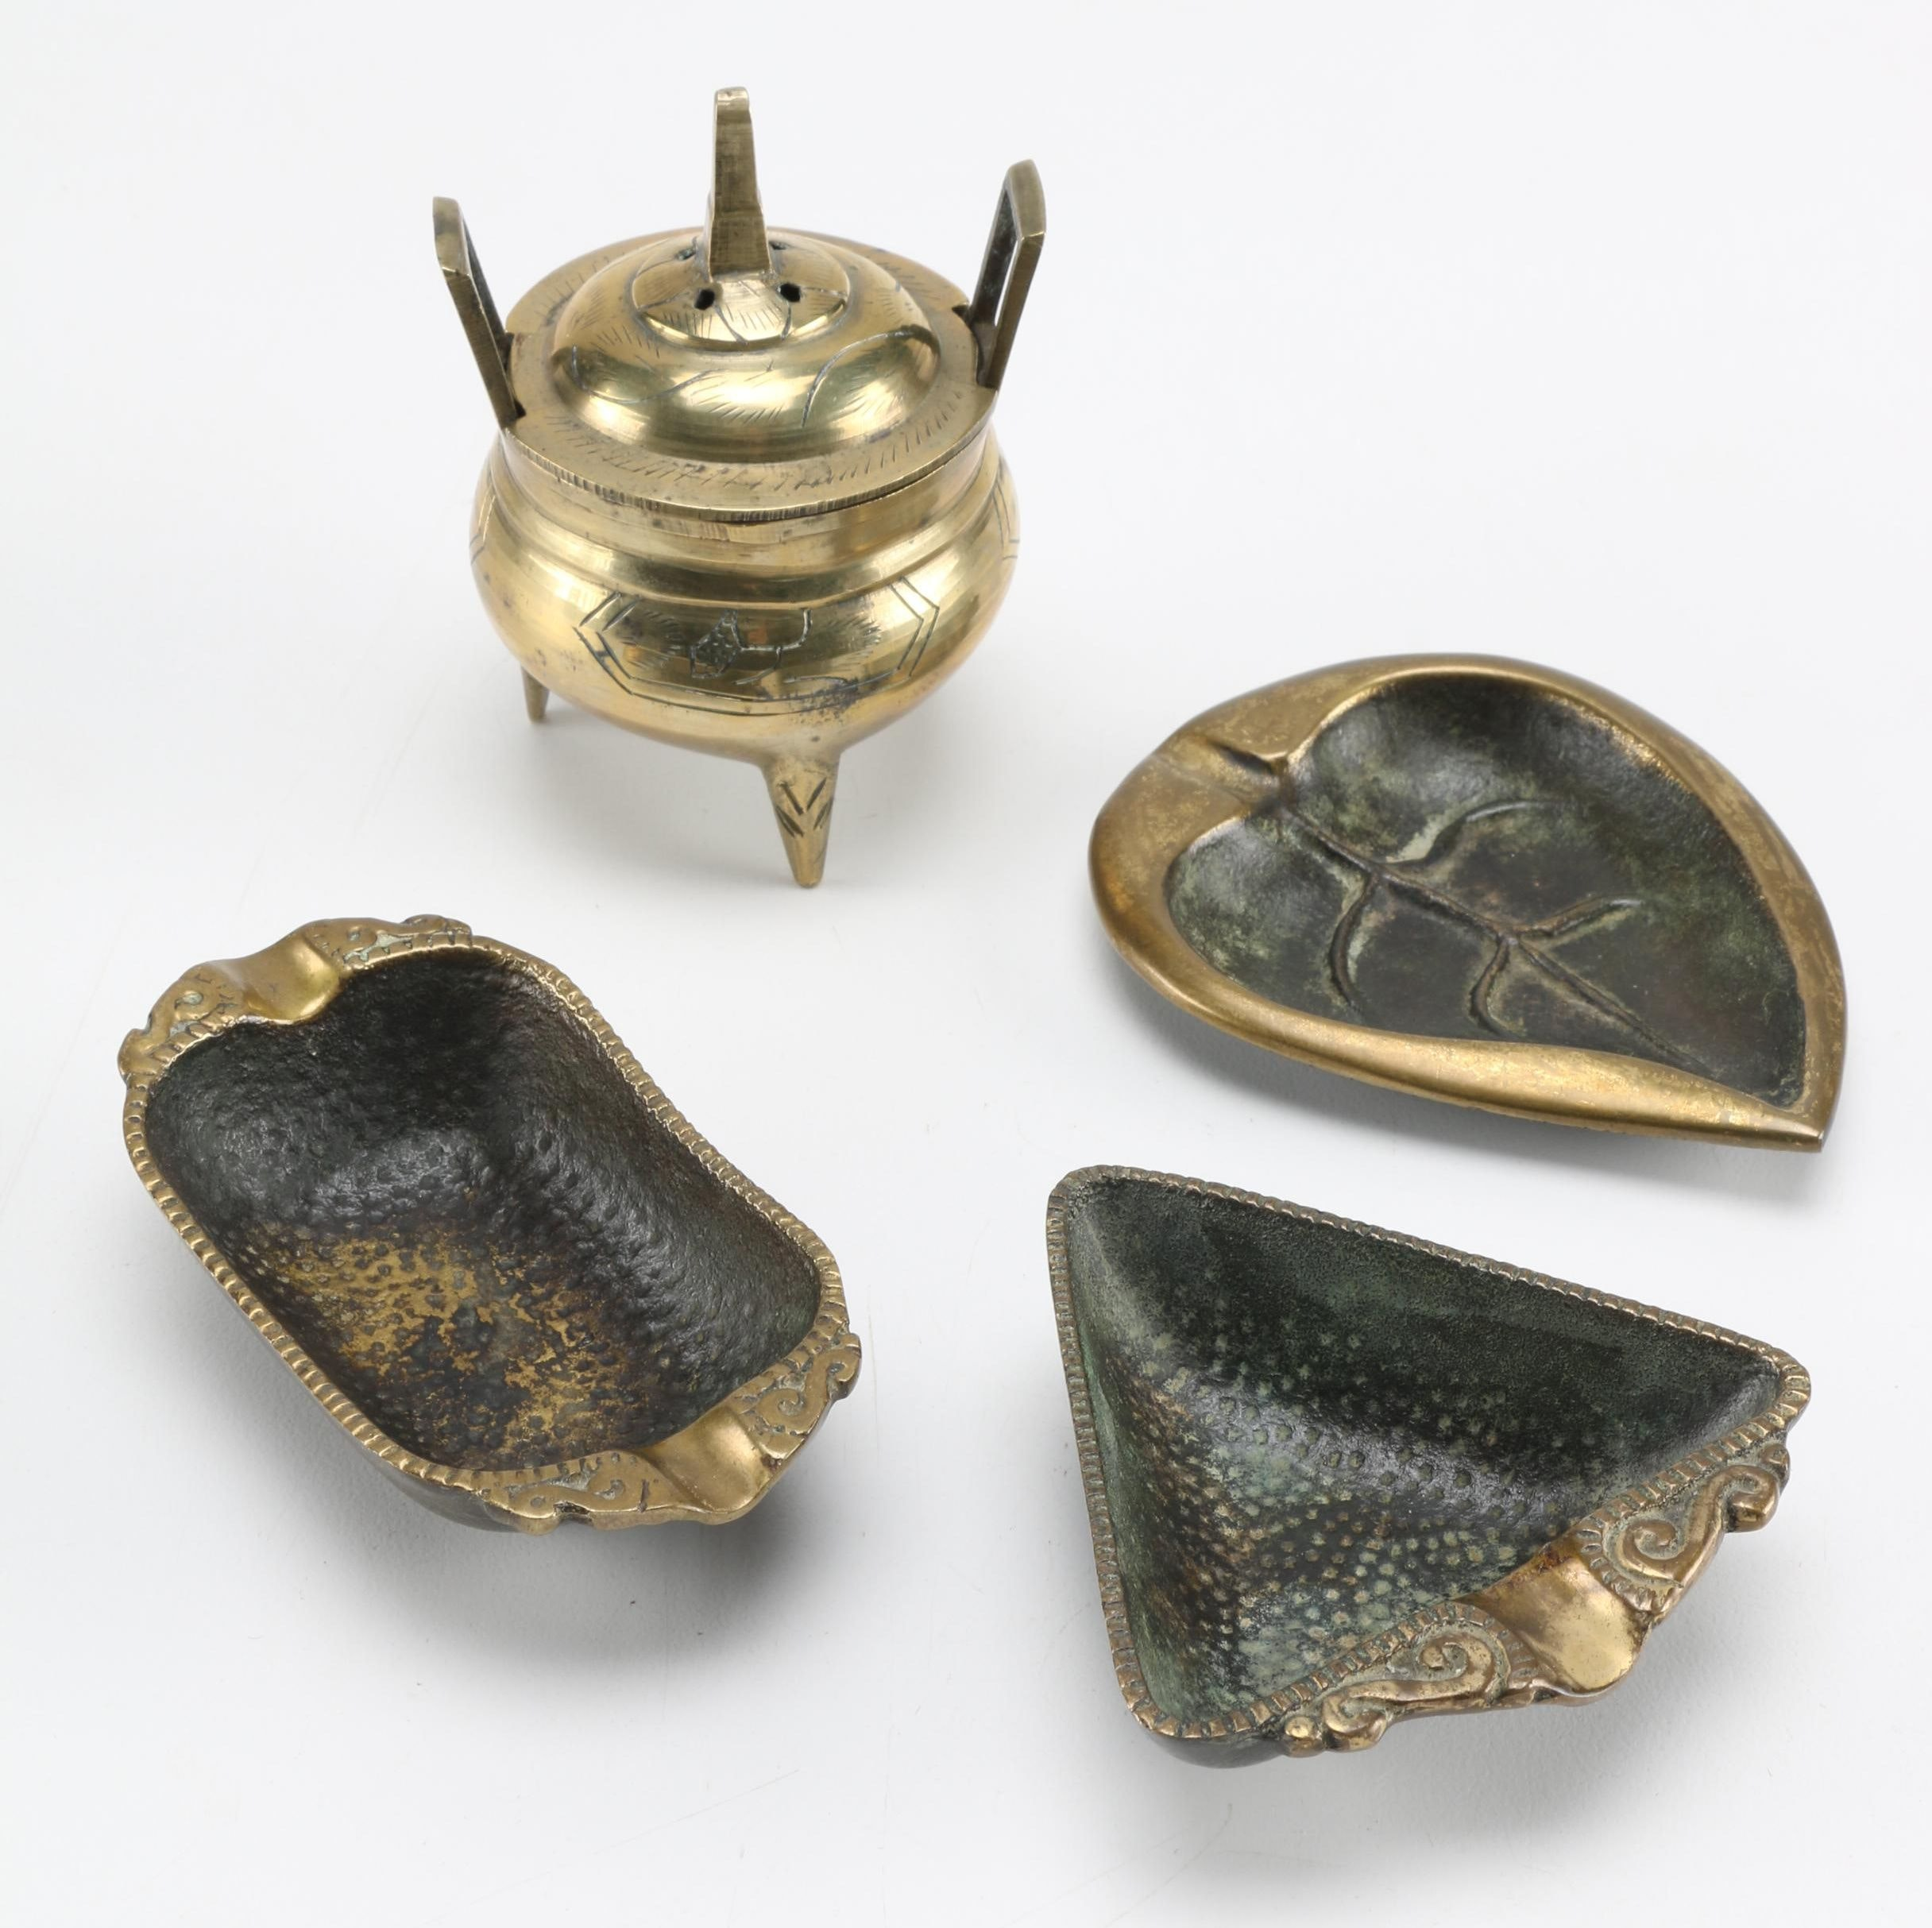 Brass Decor Featuring Nordia